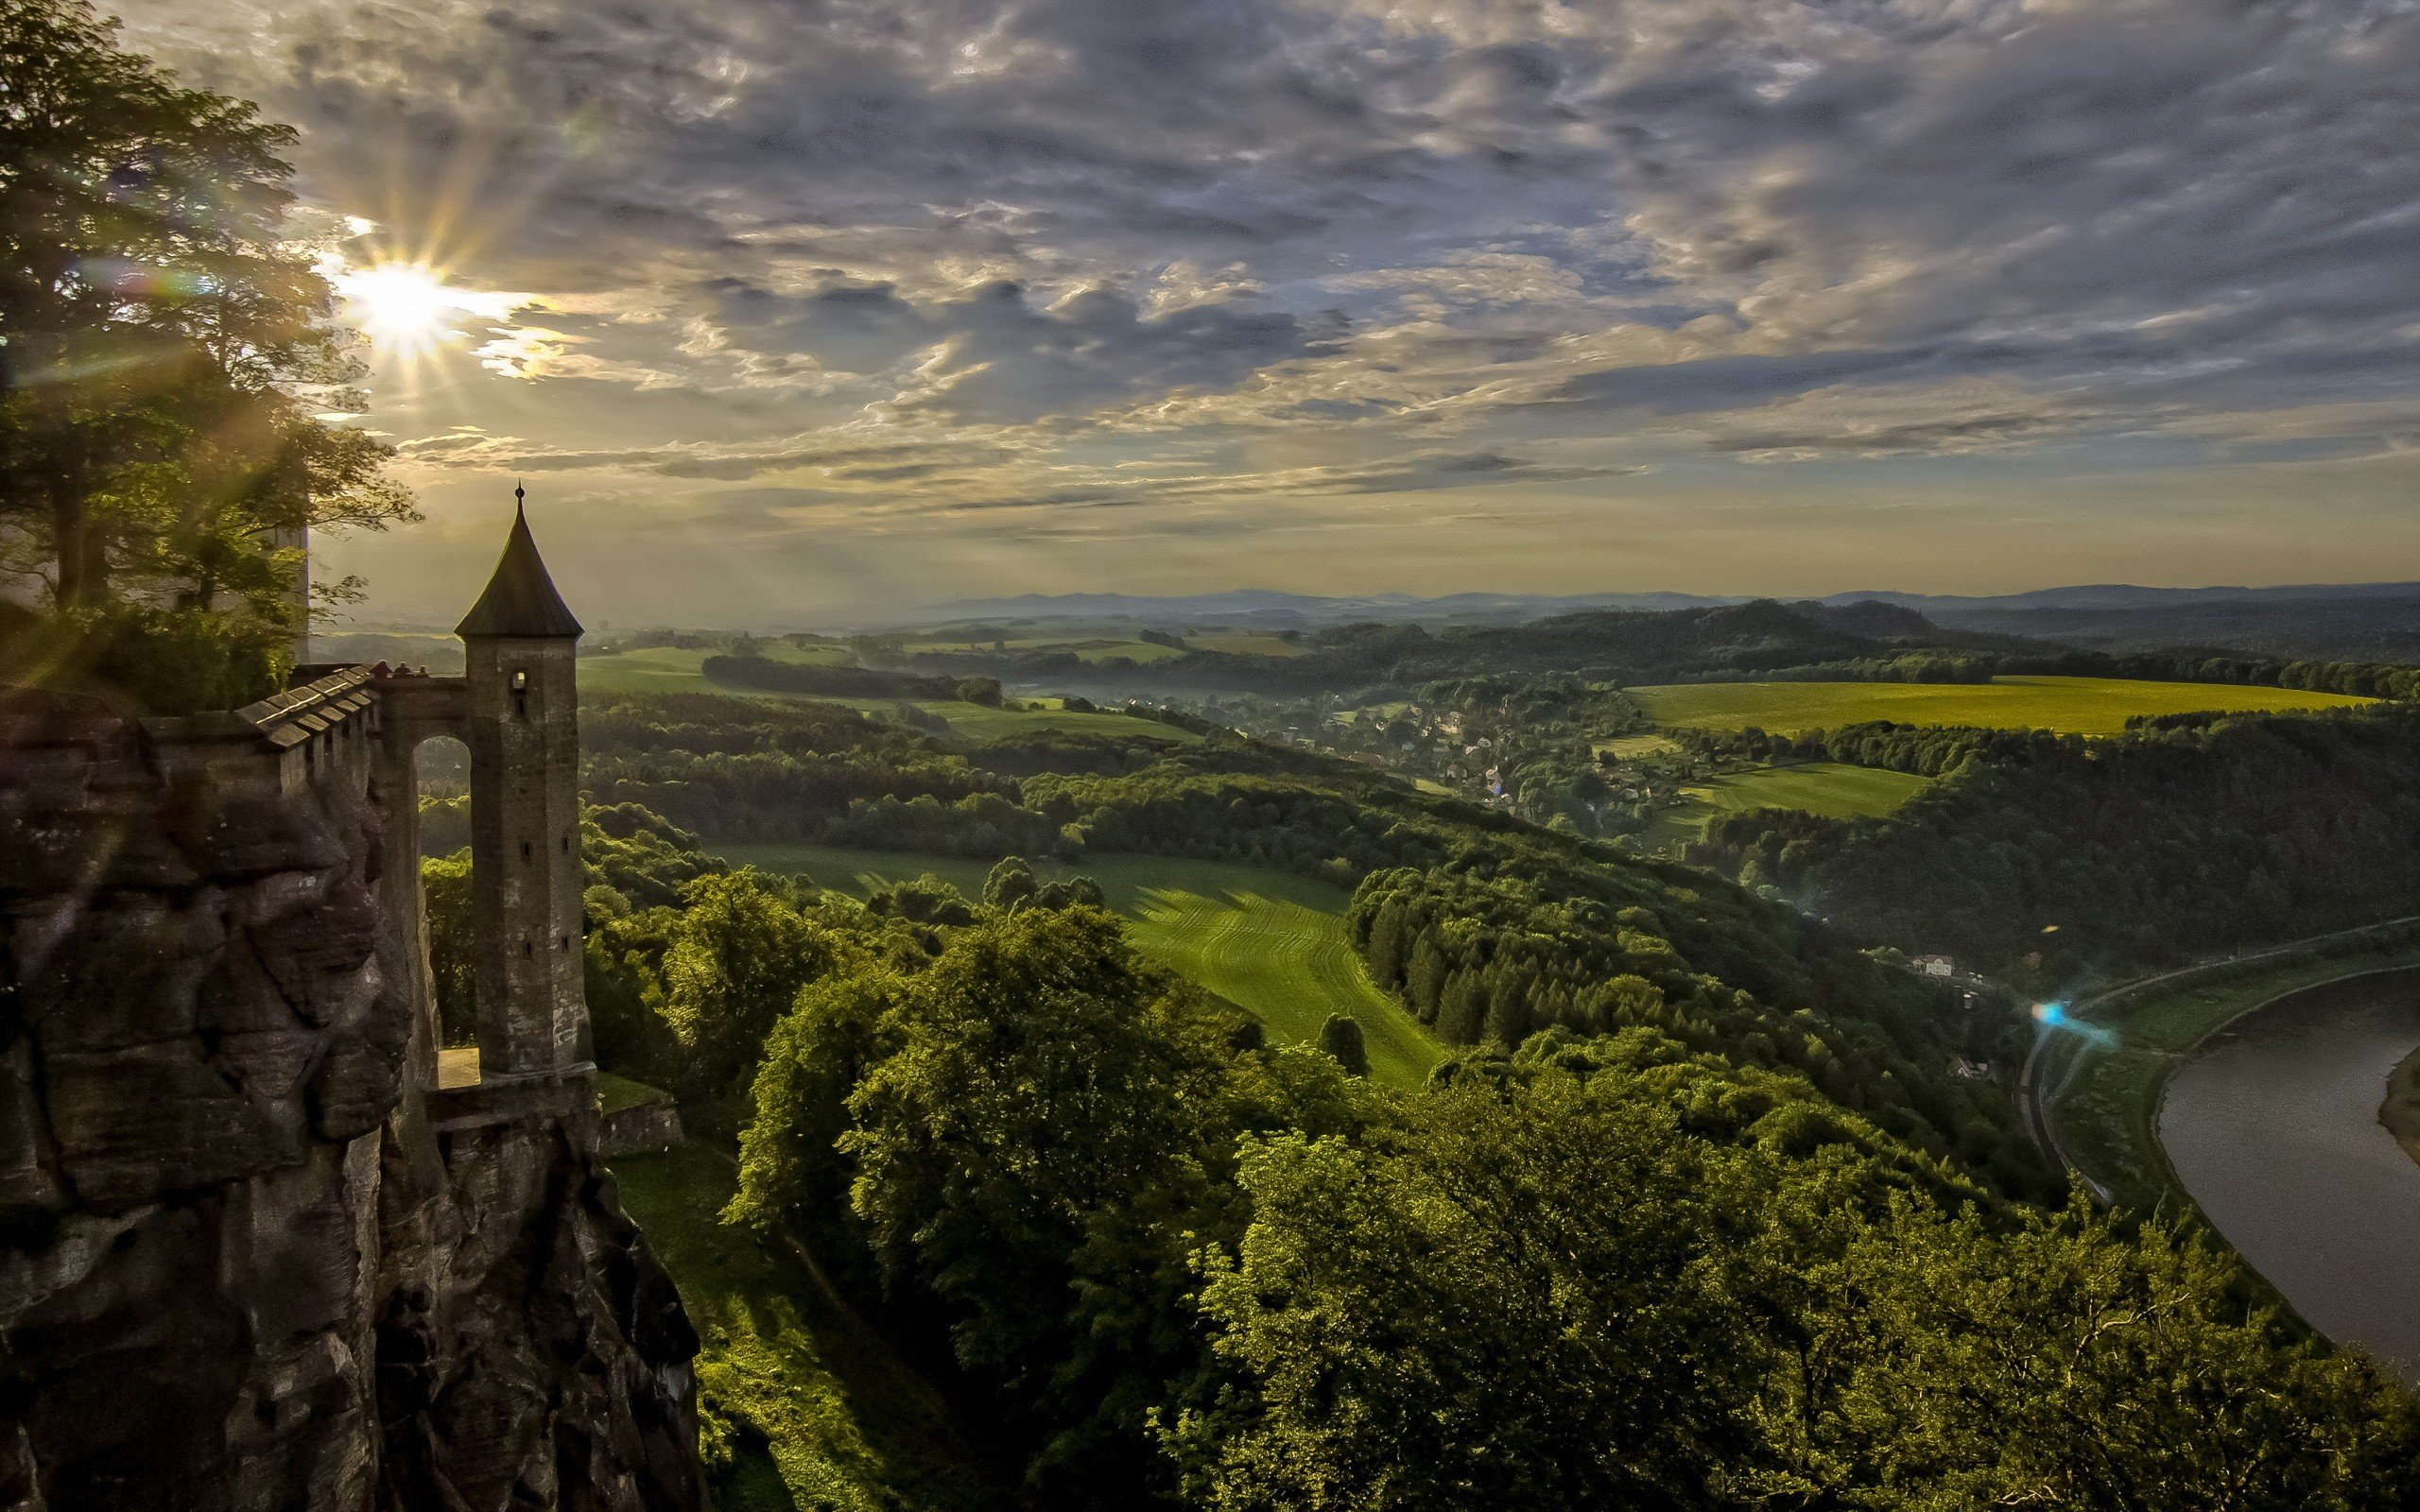 Architecture Castle Ancient Tower River Switzerland